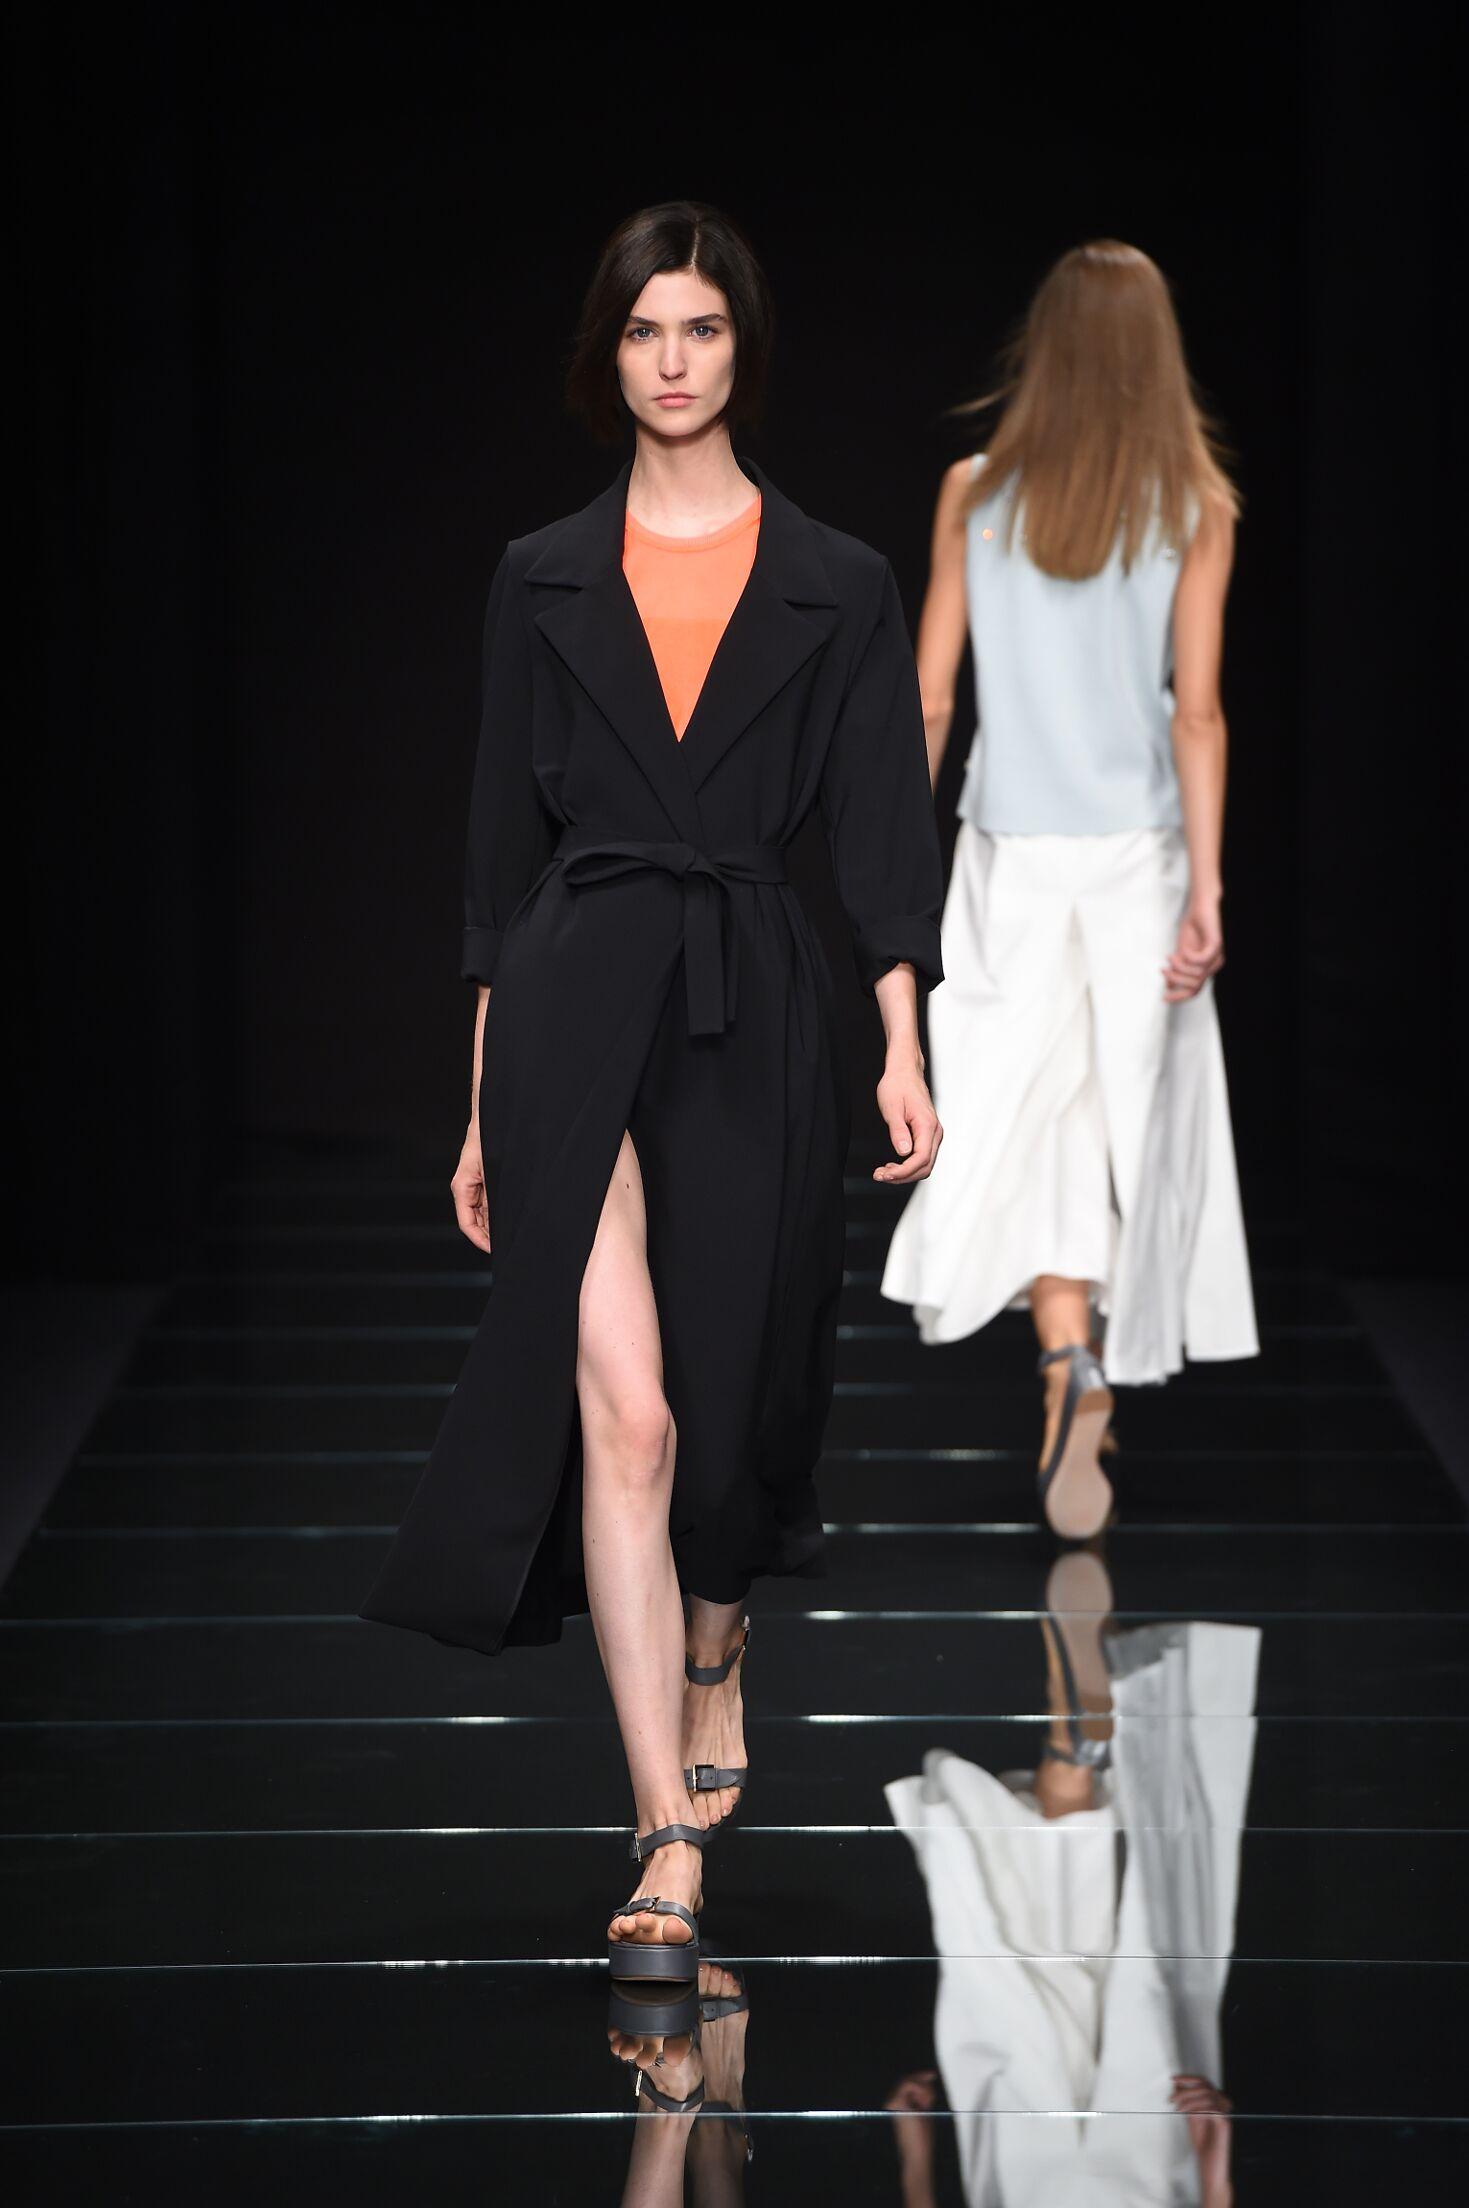 Summer Fashion Trends 2015 Anteprima